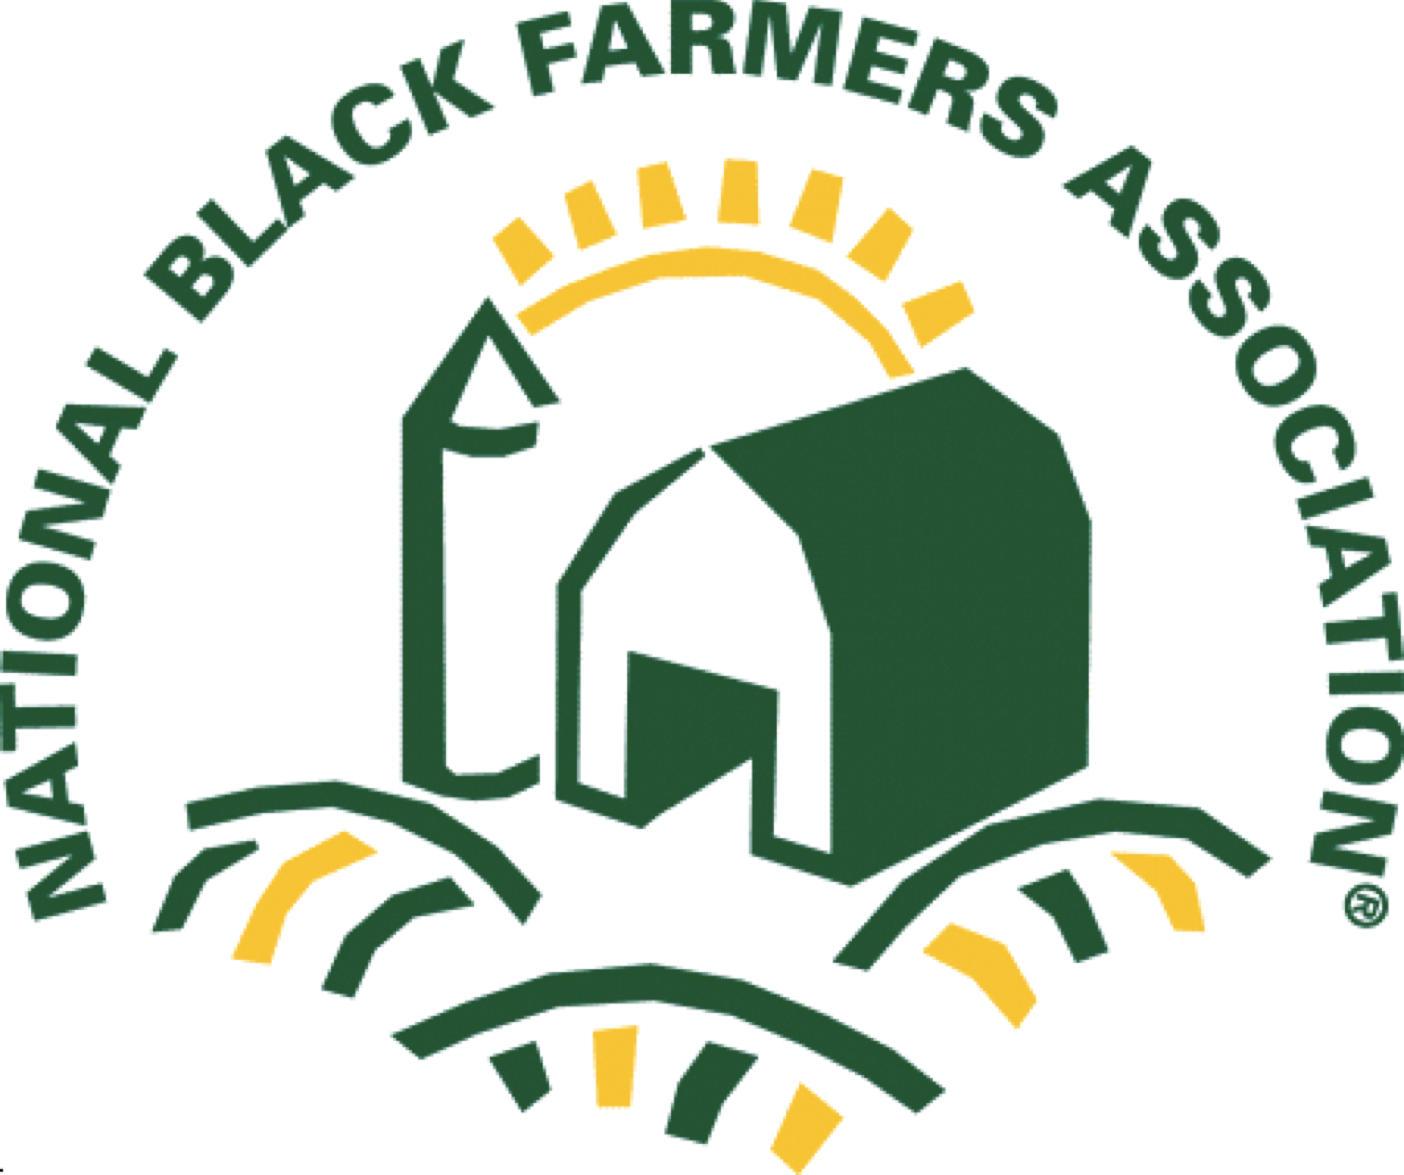 Incorporated land groups clipart jpg royalty free NationalBlackFarmersAssociation.org jpg royalty free